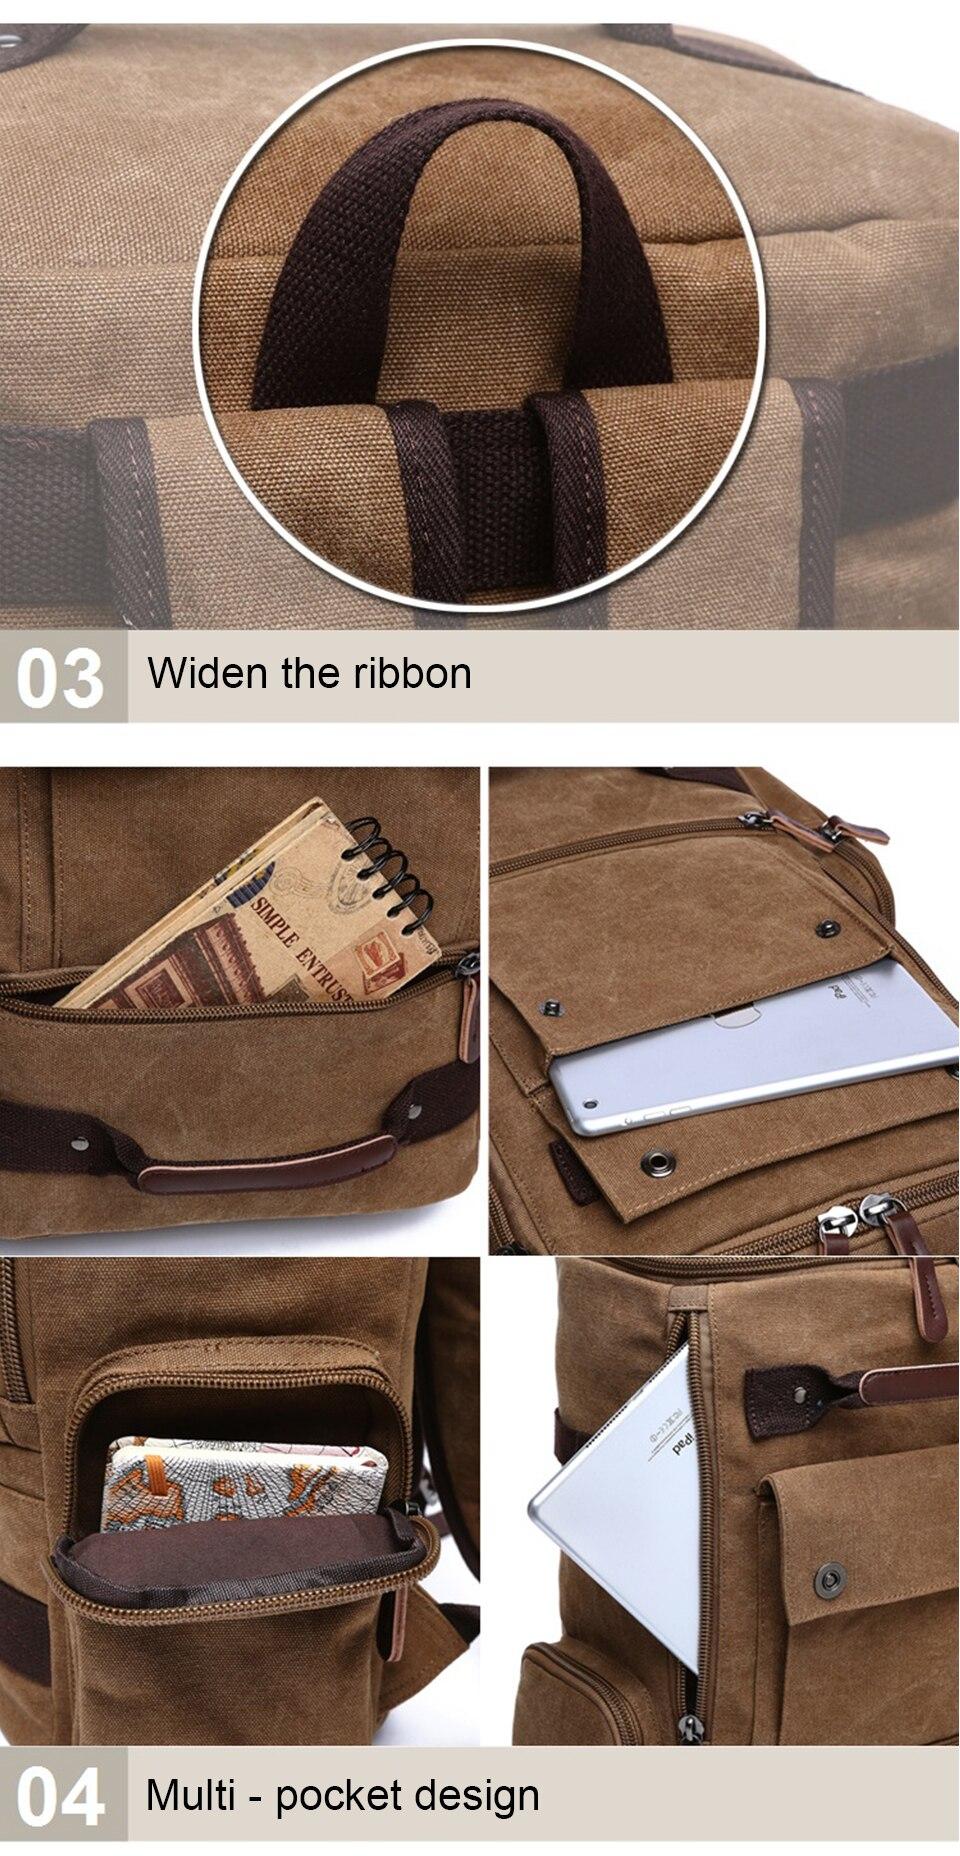 9 Canvas Backpack 15.6'' Laptop Backpacks Men Bagpack Wearproof School Bag for Teenage Male Knapsack Travel Bags Fashion Rucksack